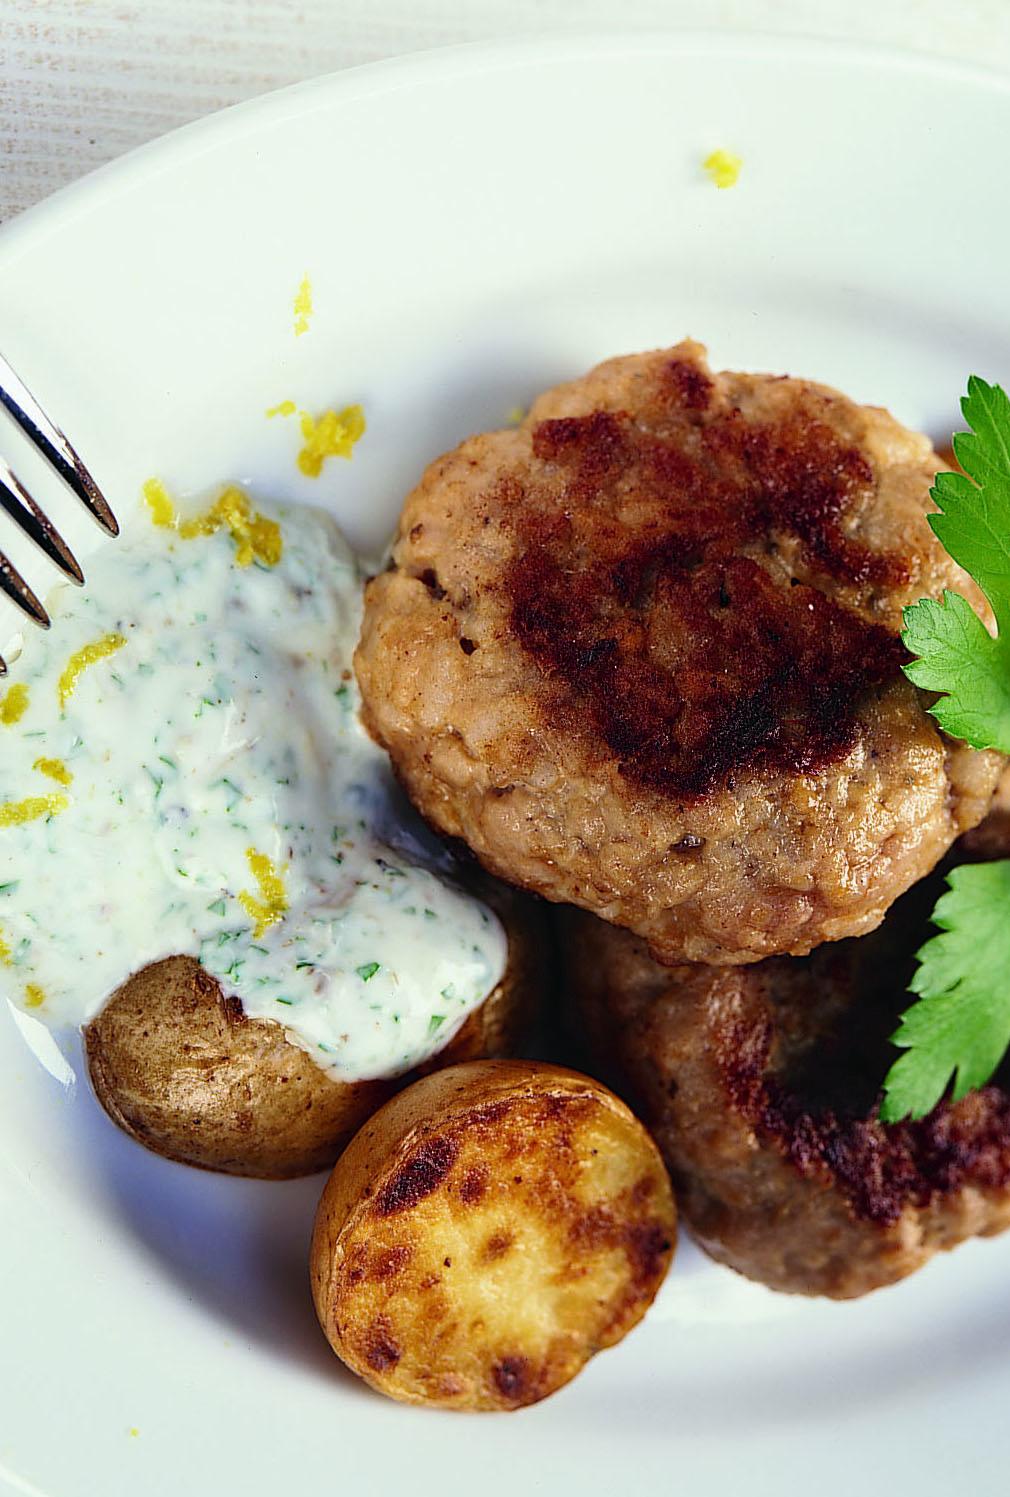 Steak de veau haché sauce yogourt au carvi